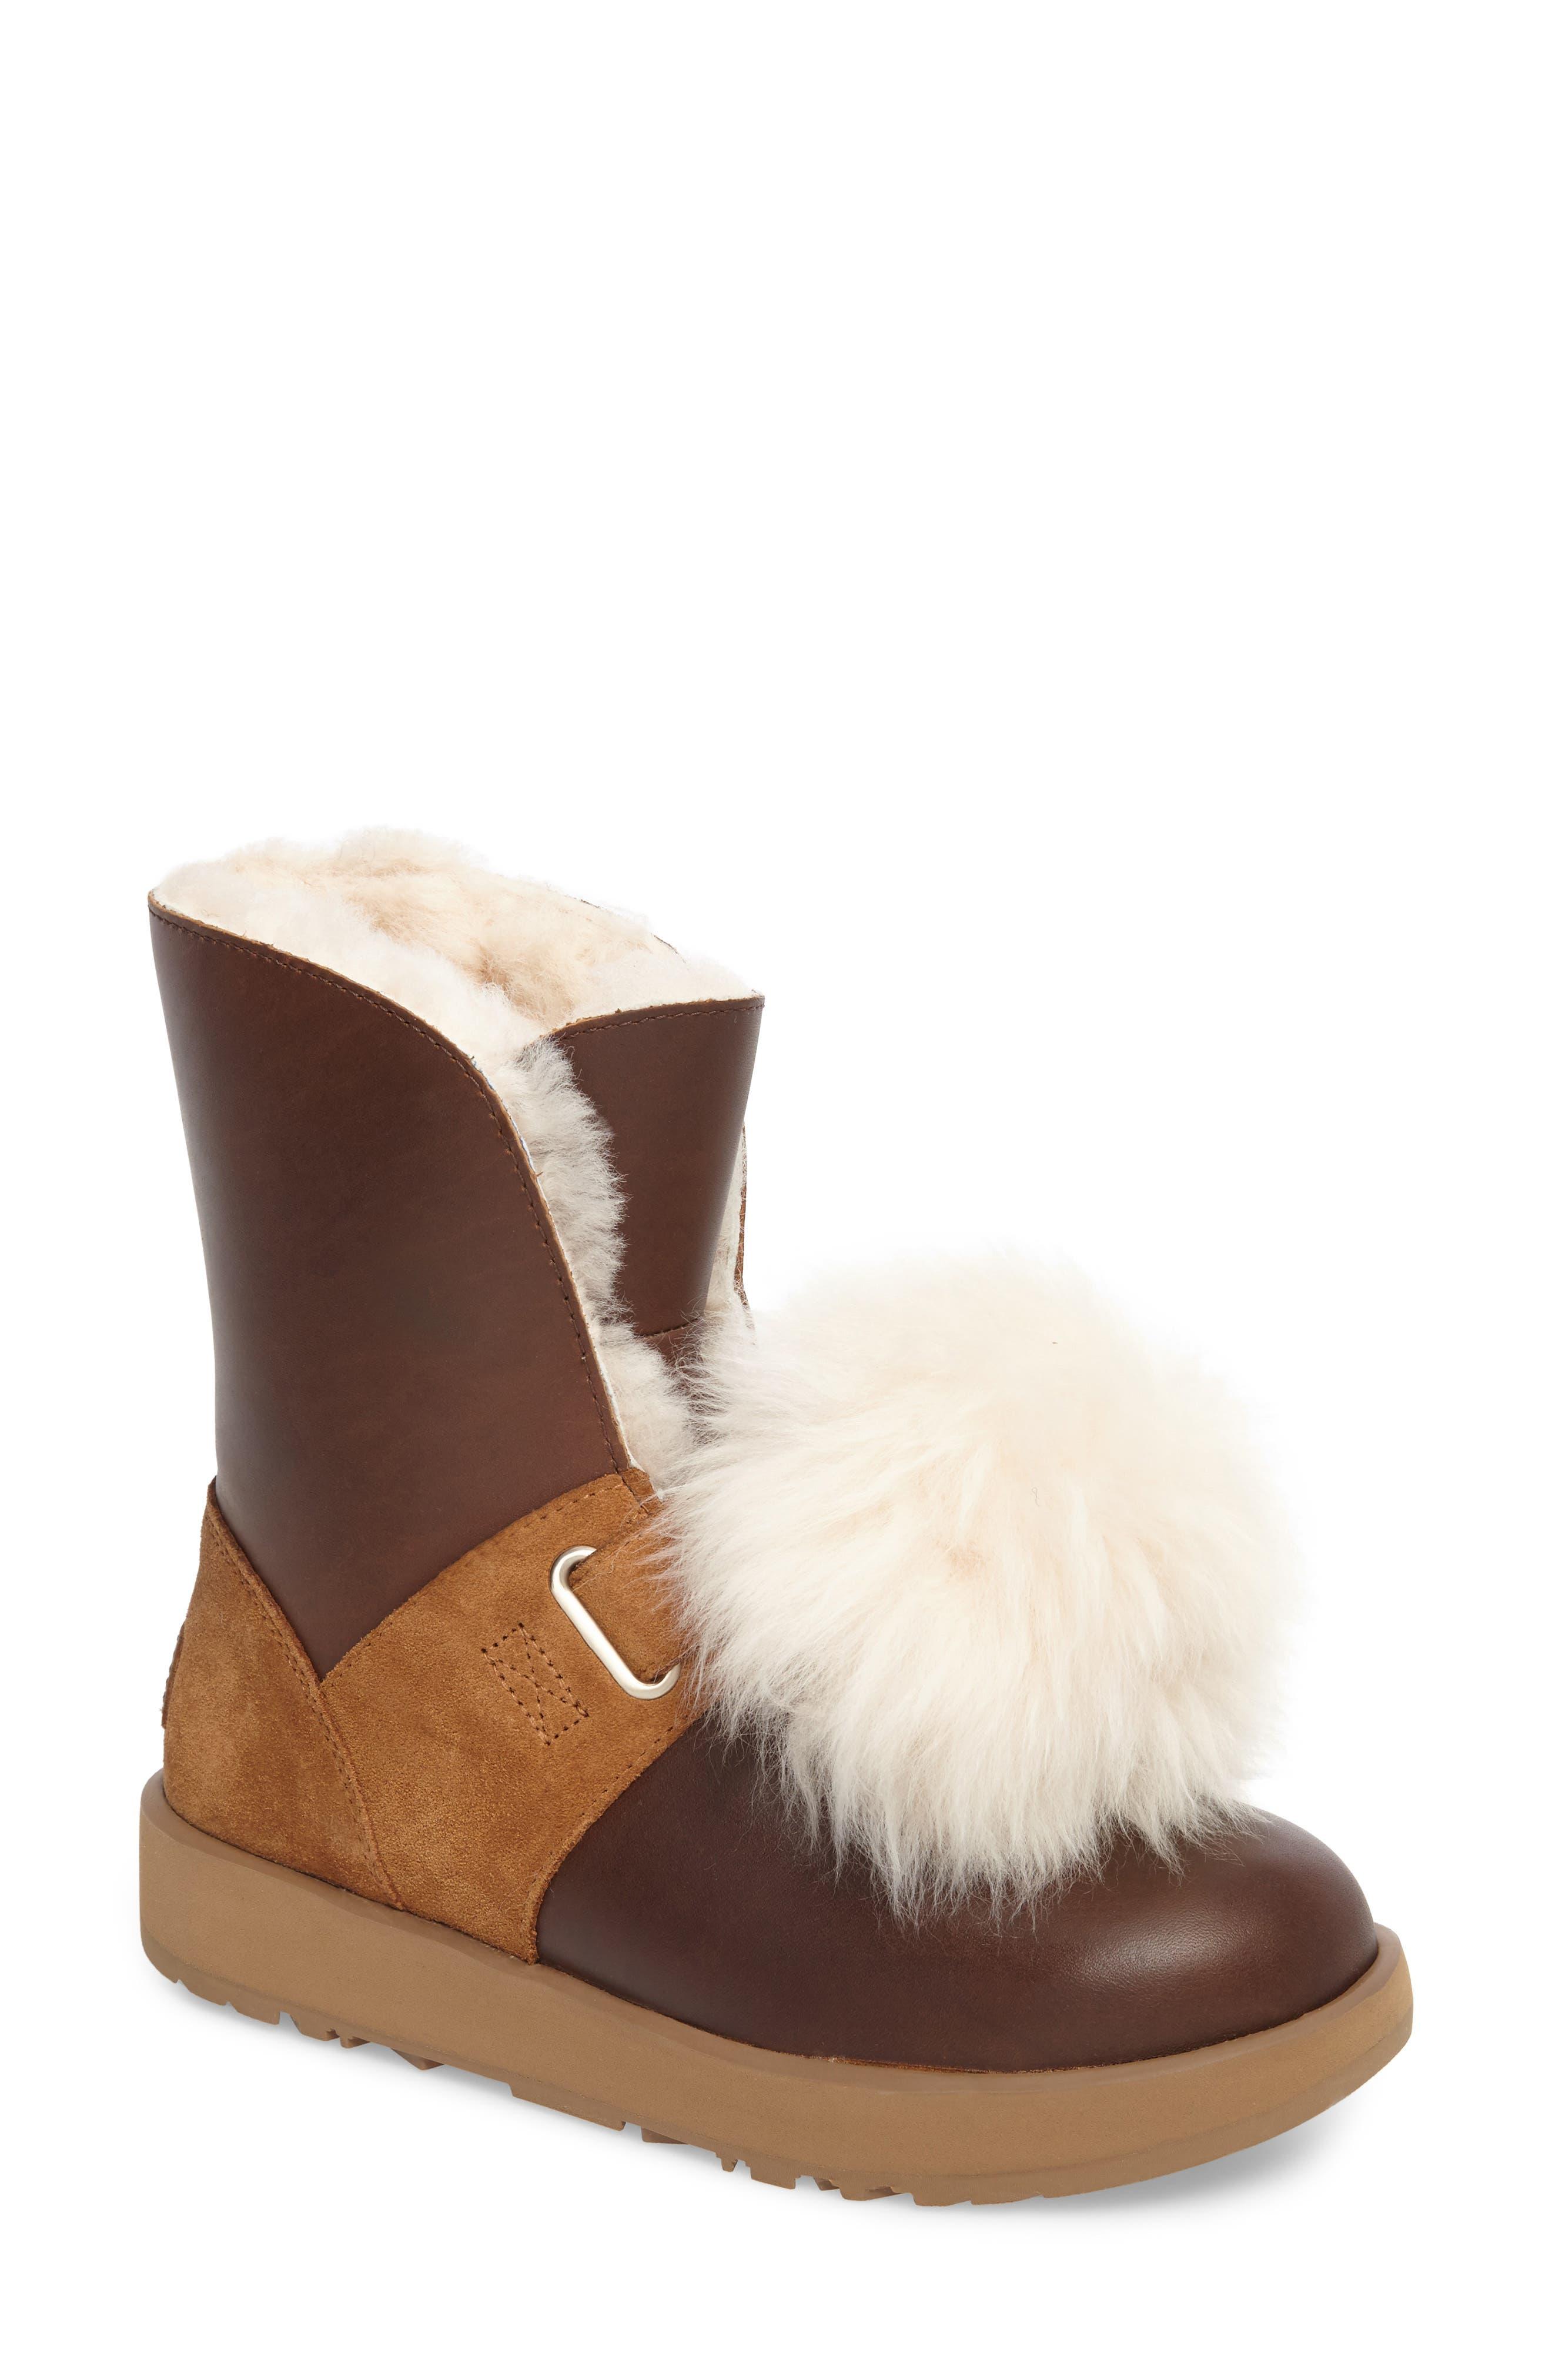 Alternate Image 1 Selected - UGG® Isley Genuine Shearling Pompom Waterproof Boot (Women)